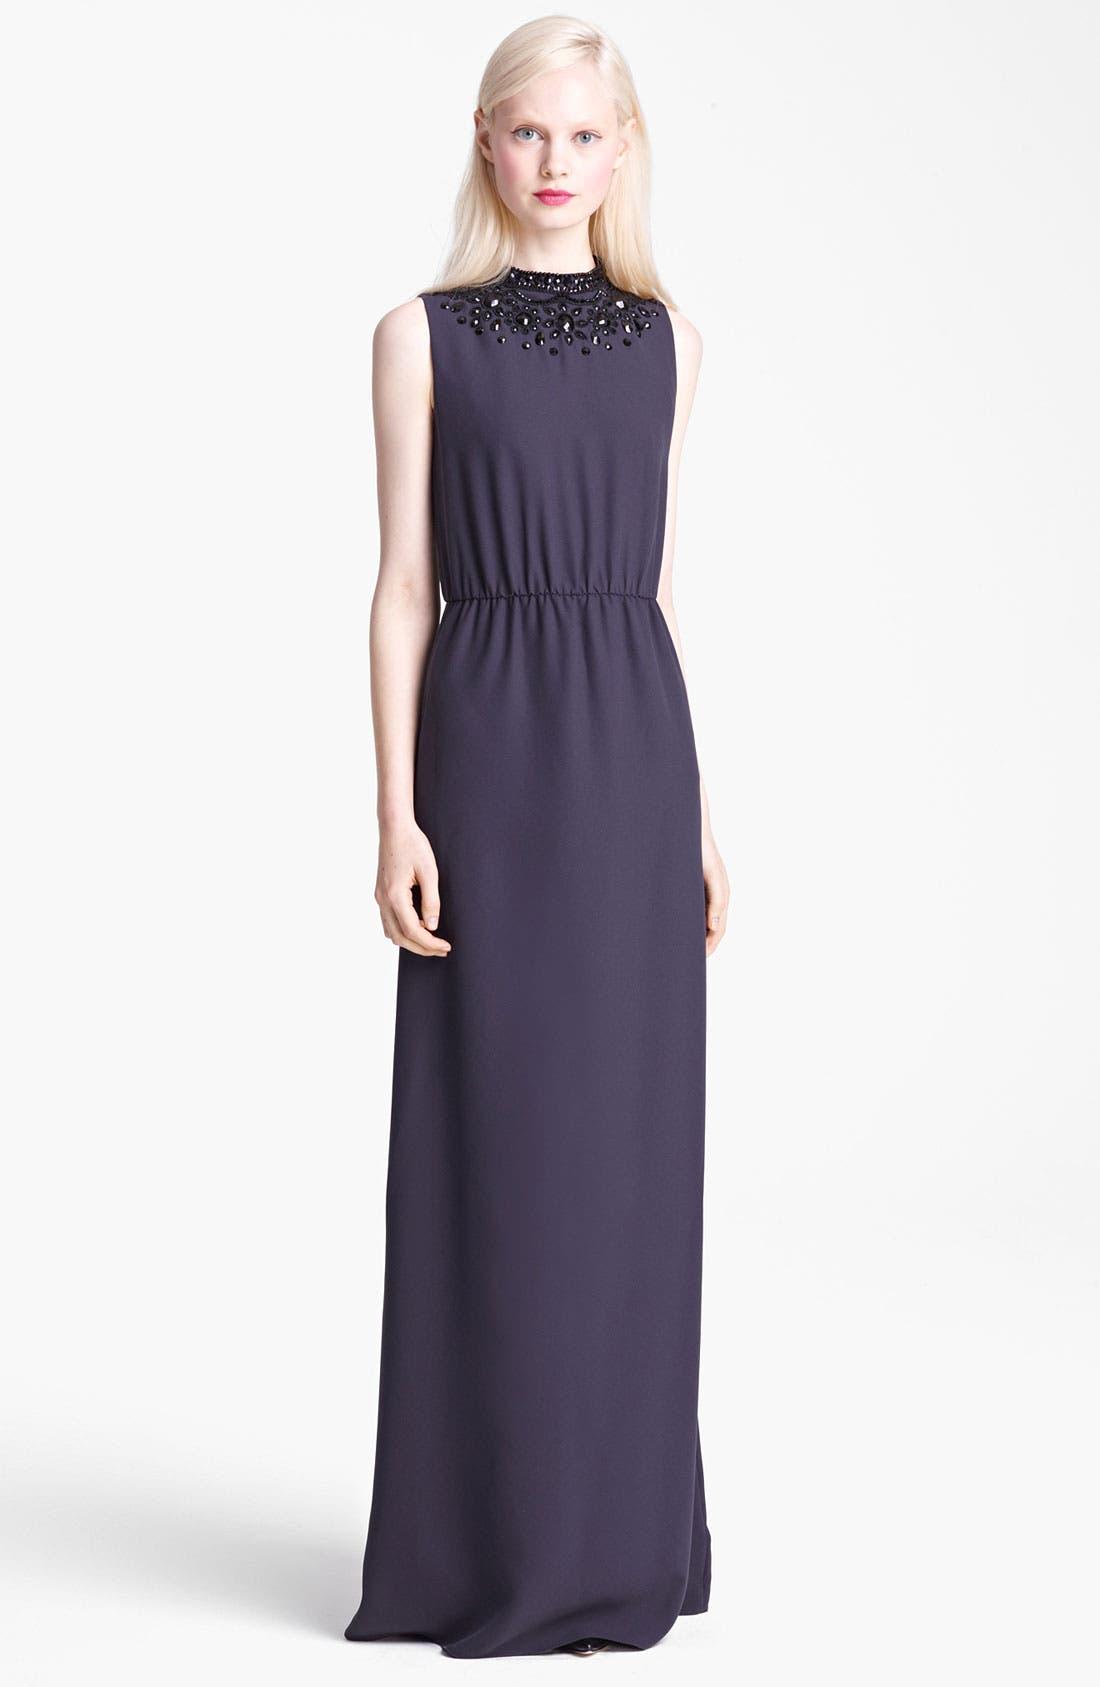 Alternate Image 1 Selected - Moschino Cheap & Chic Beaded Neckline Maxi Dress